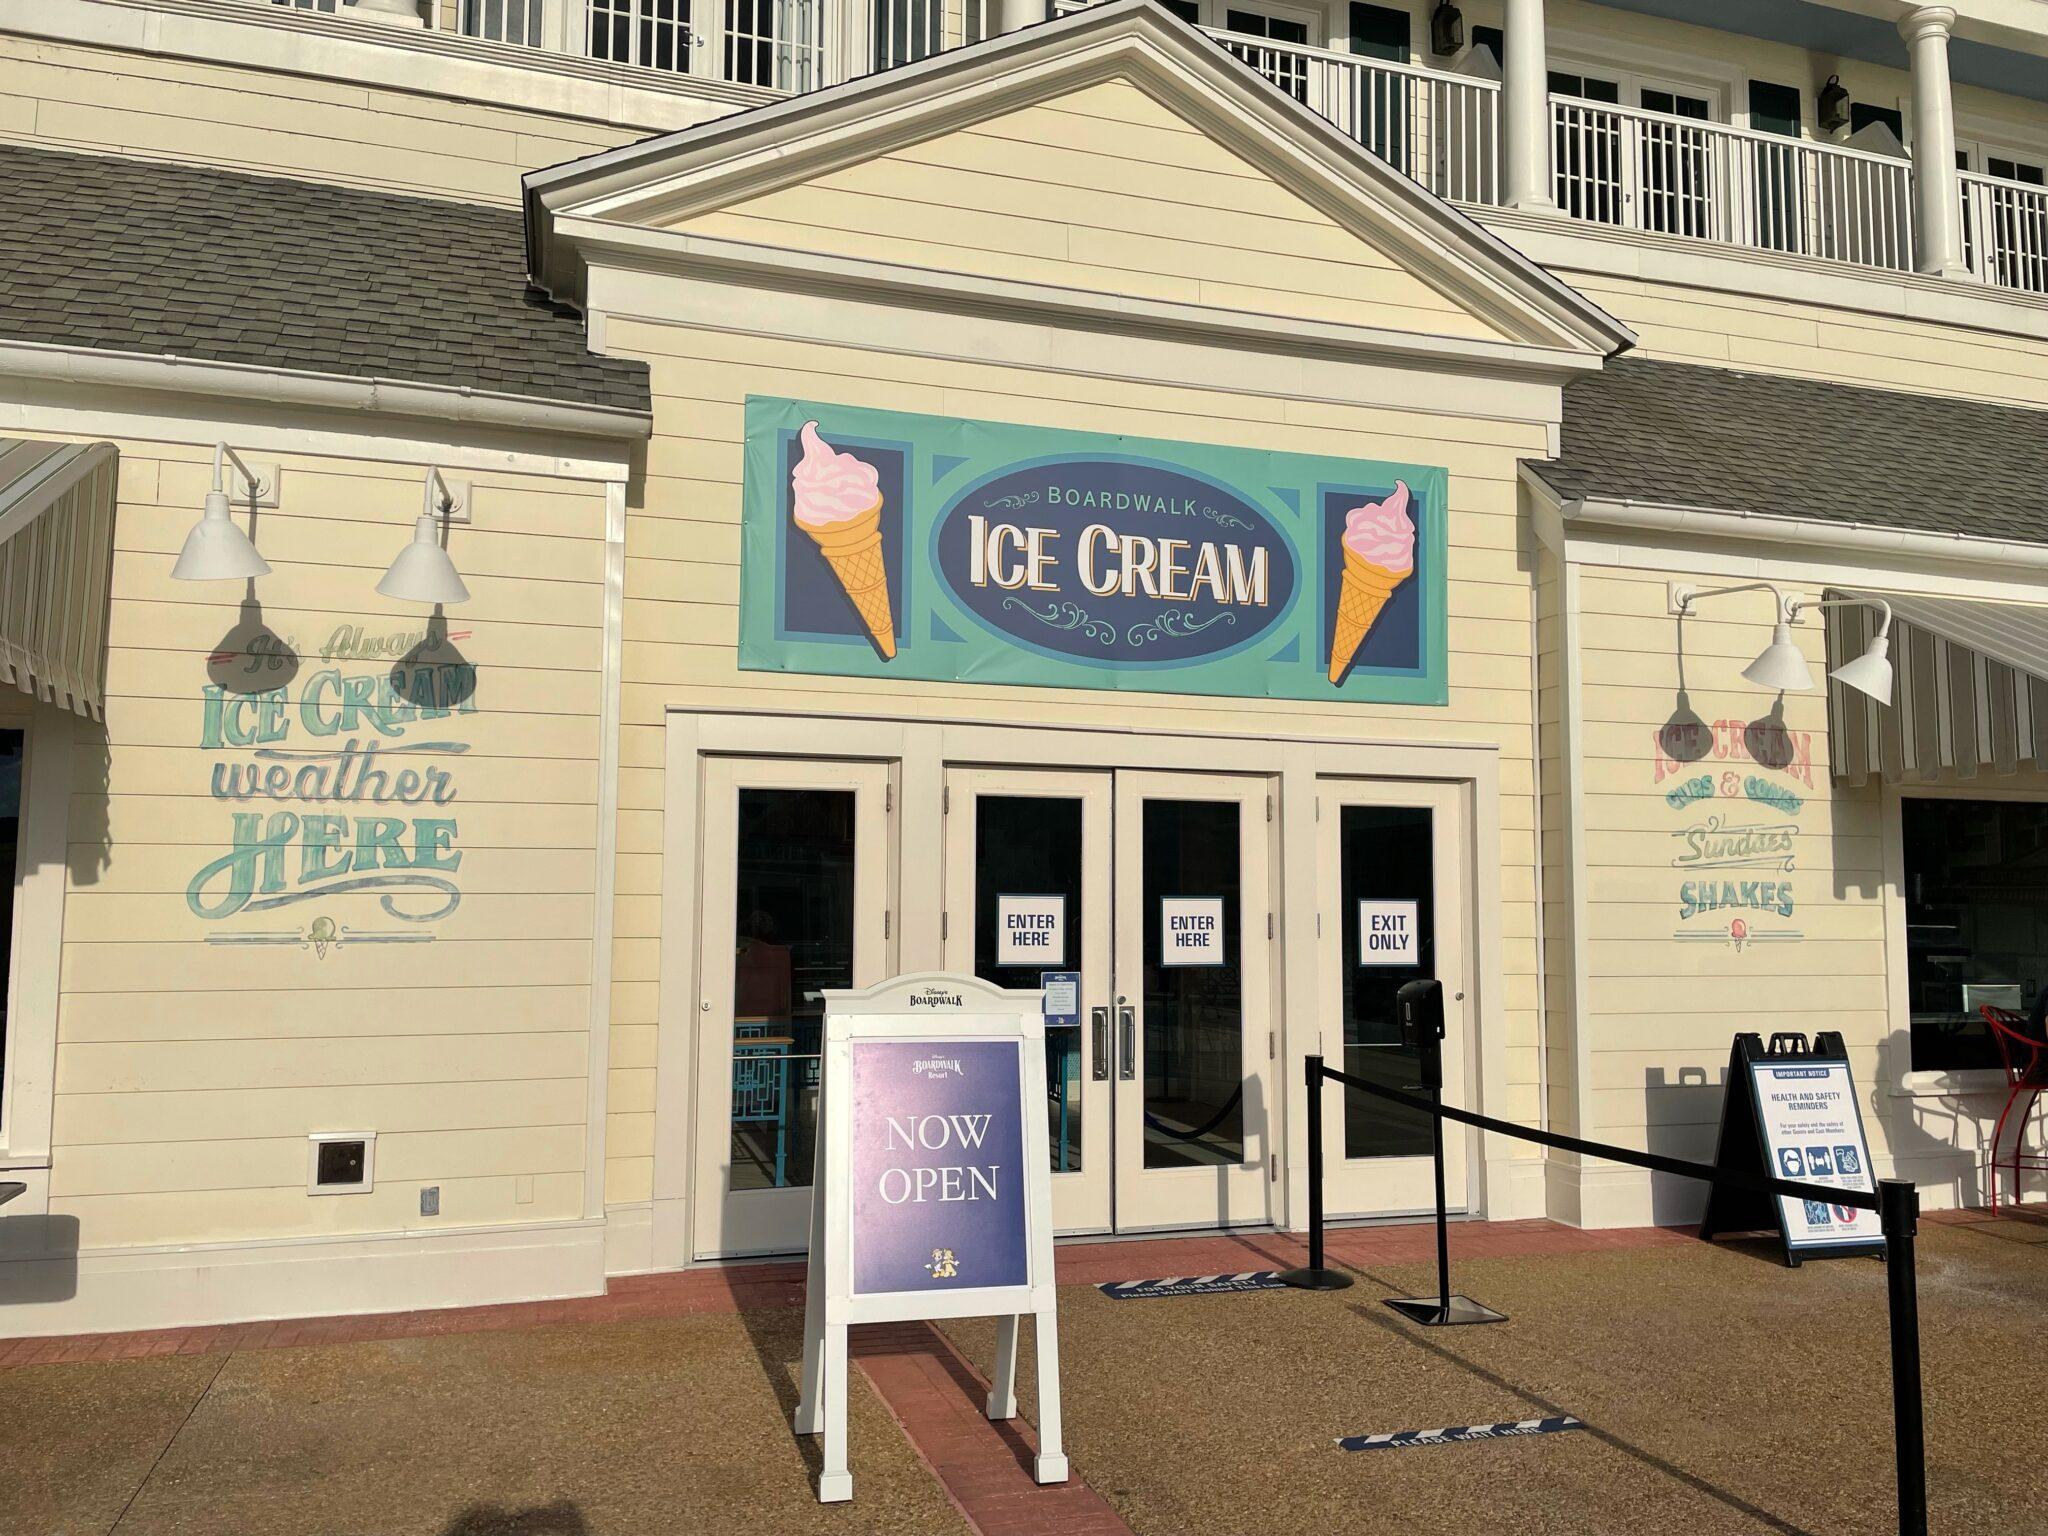 BoardWalk Ice Cream